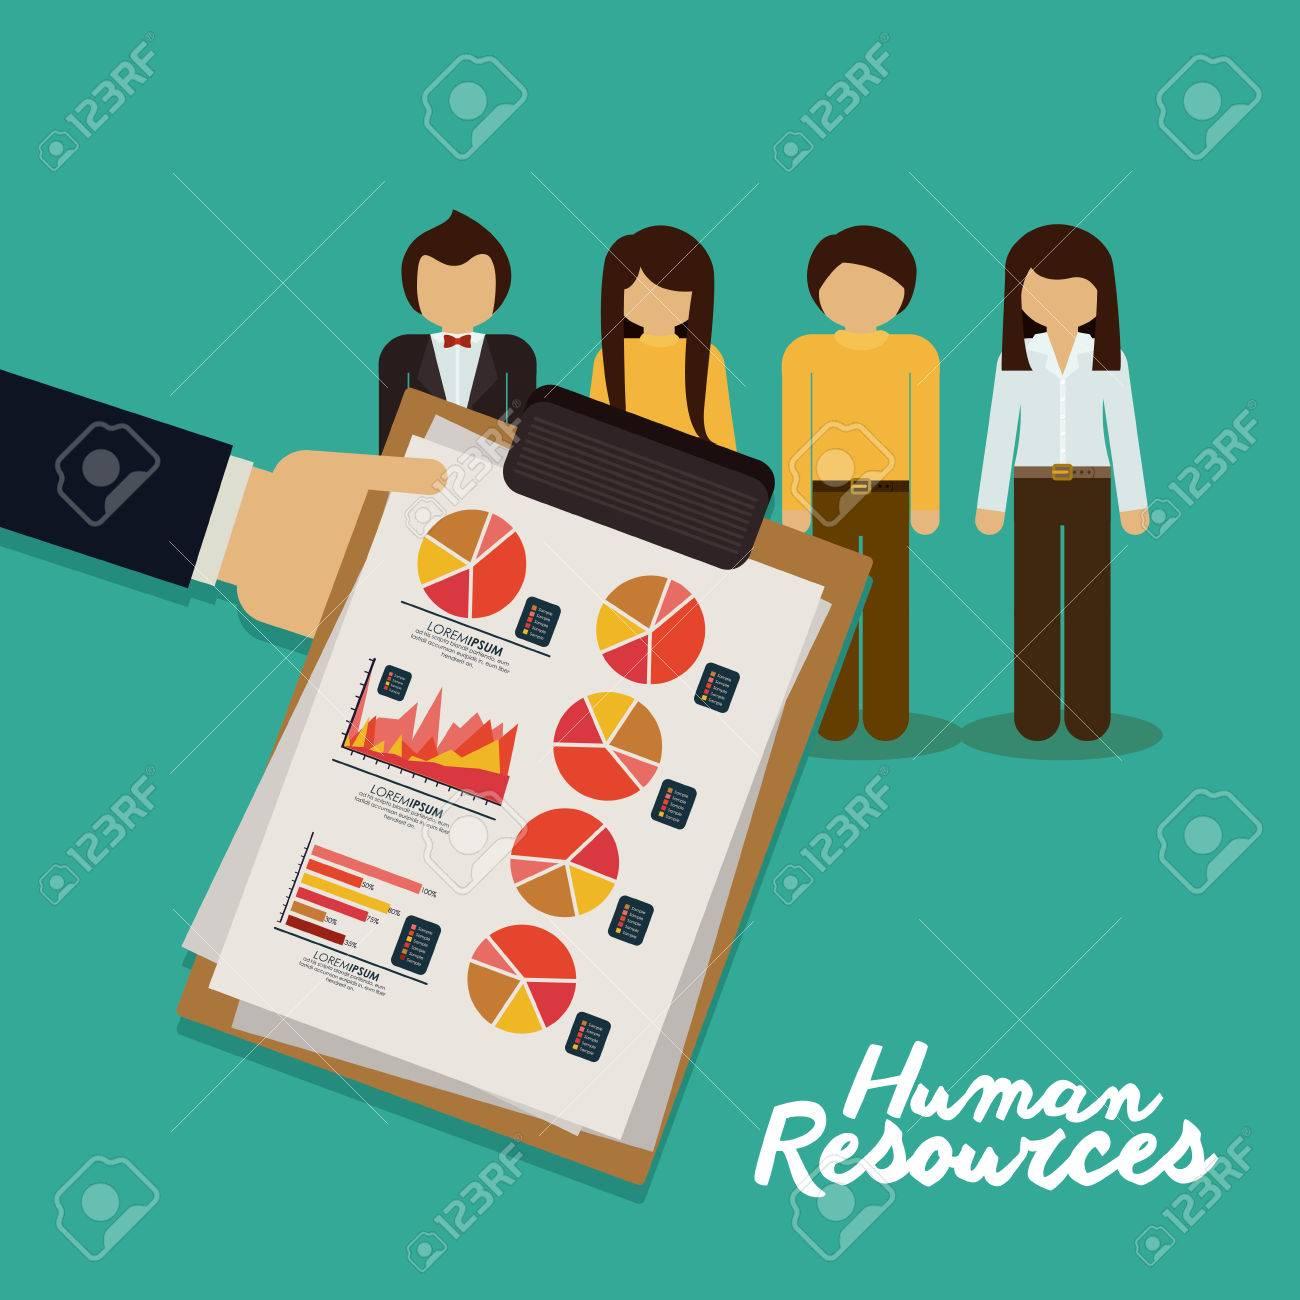 Human resources design - 44603165